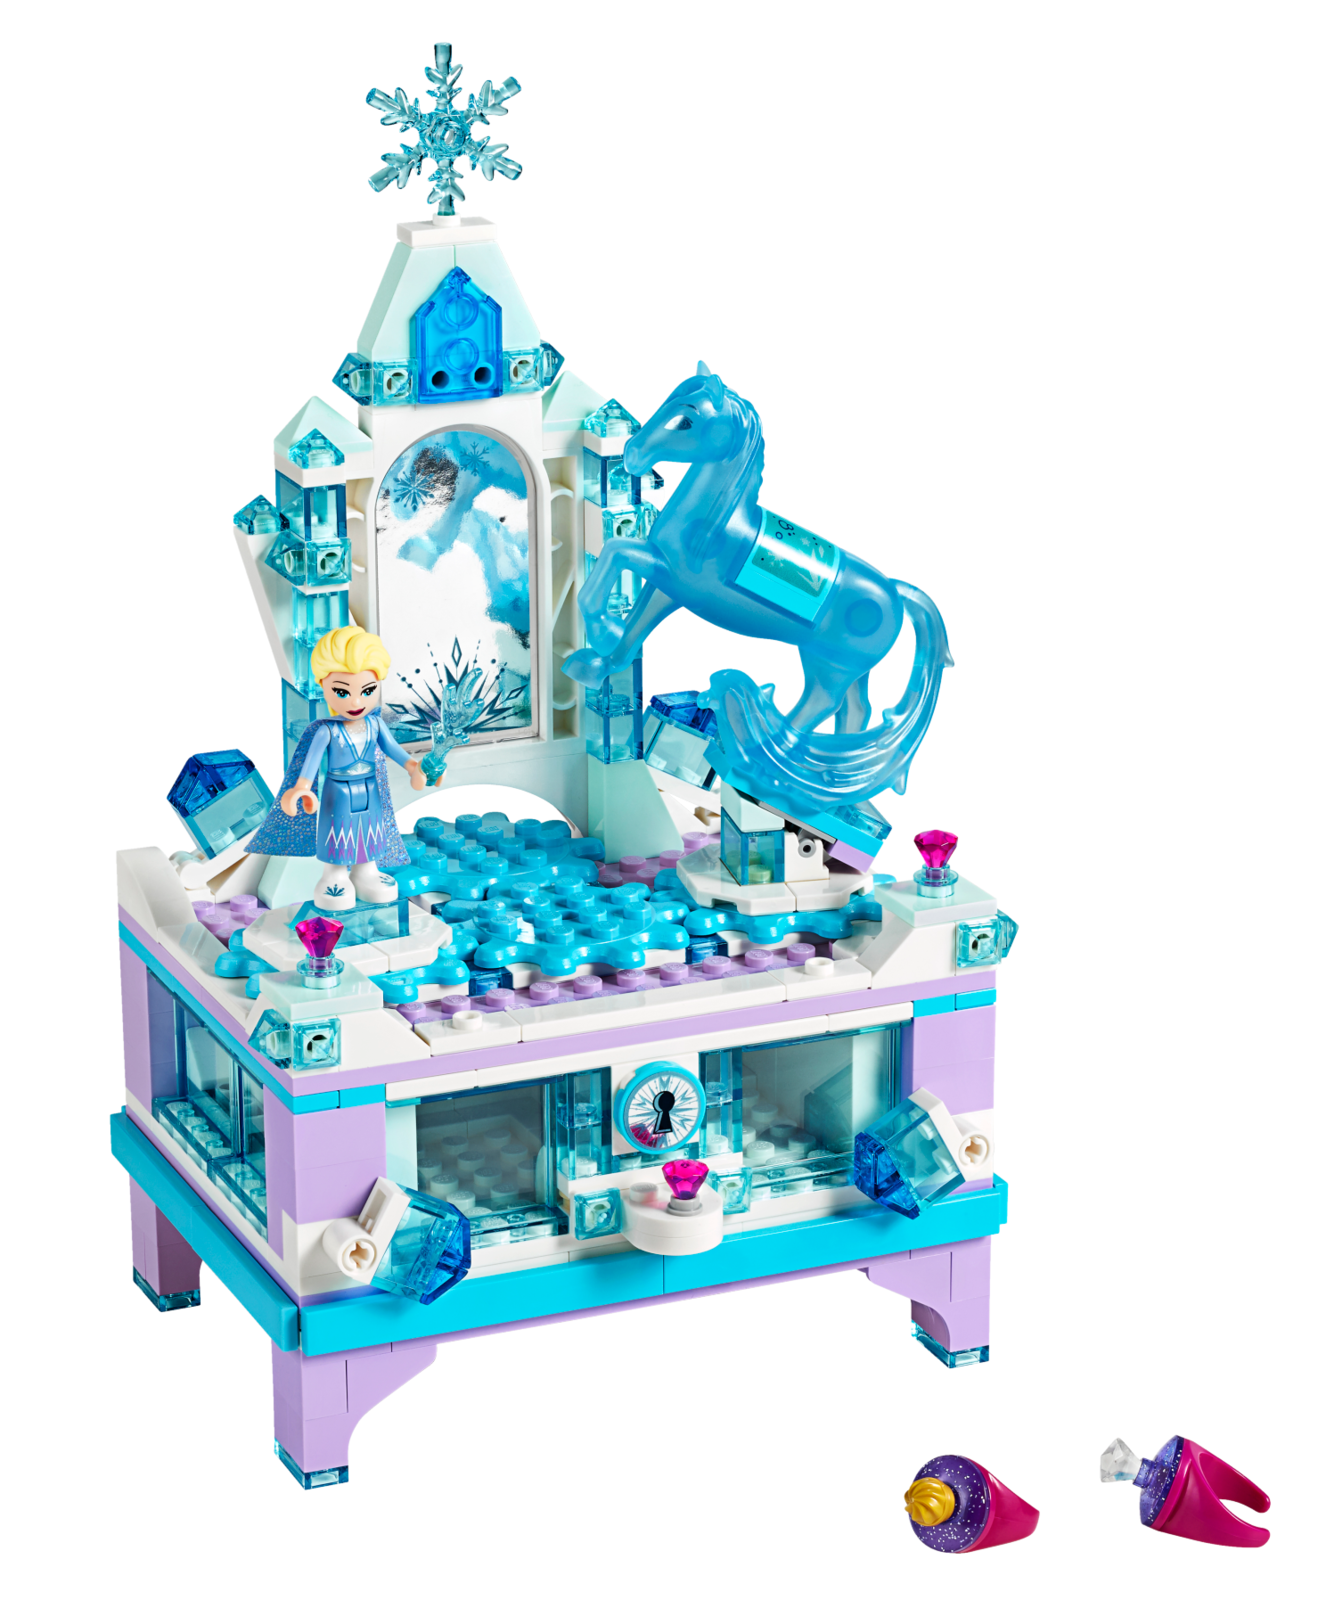 LEGO Disney: Frozen II - Elsa's Jewellery Box Creation (41168) image